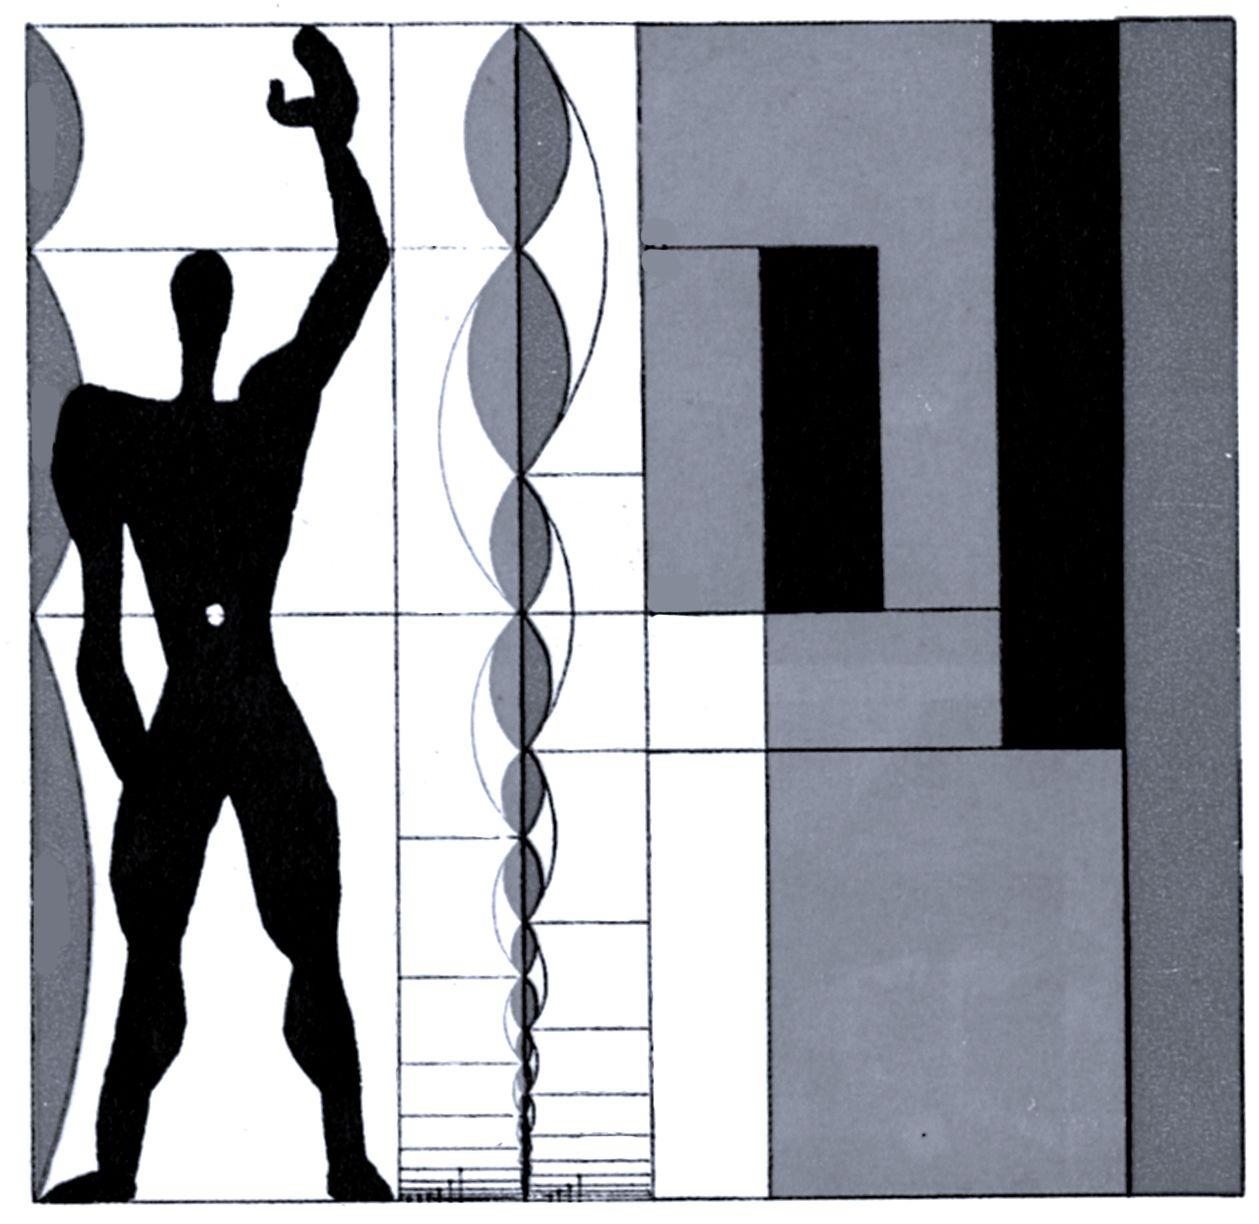 le corbusier modular man research kk graphics pinterest. Black Bedroom Furniture Sets. Home Design Ideas